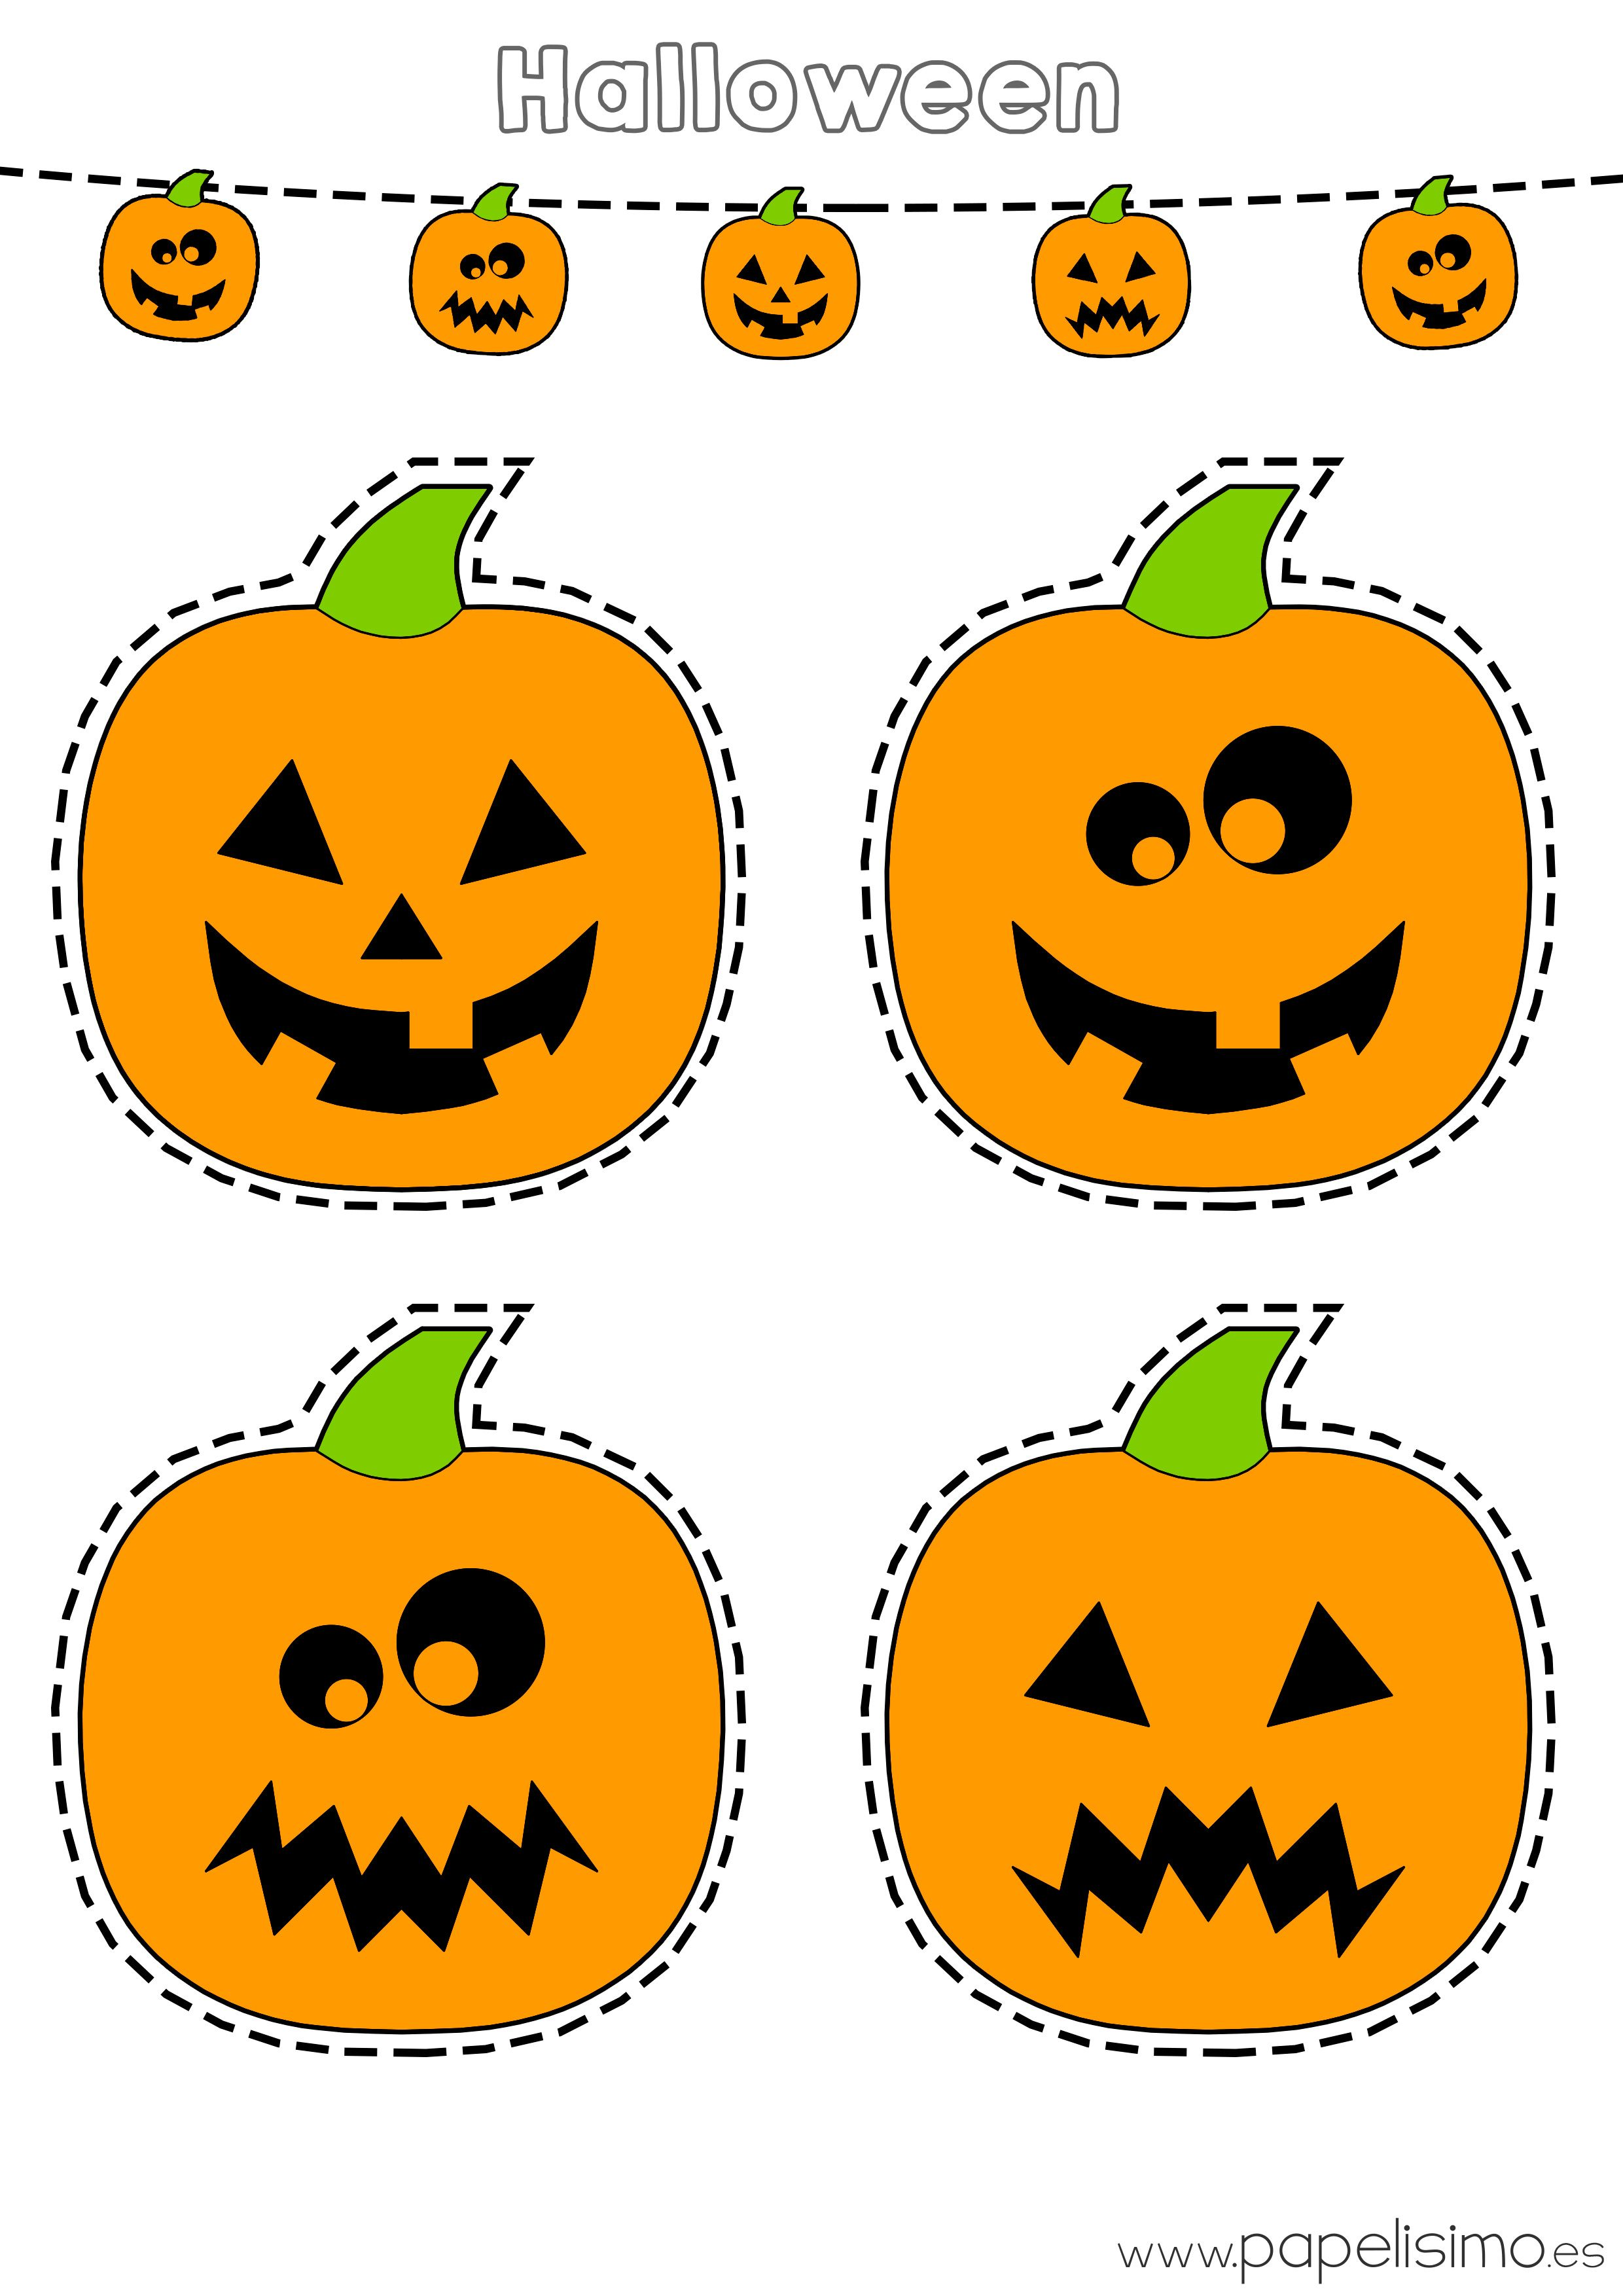 Descarga gratis dos l minas de calabazas de halloween - Decorar calabaza halloween ninos ...